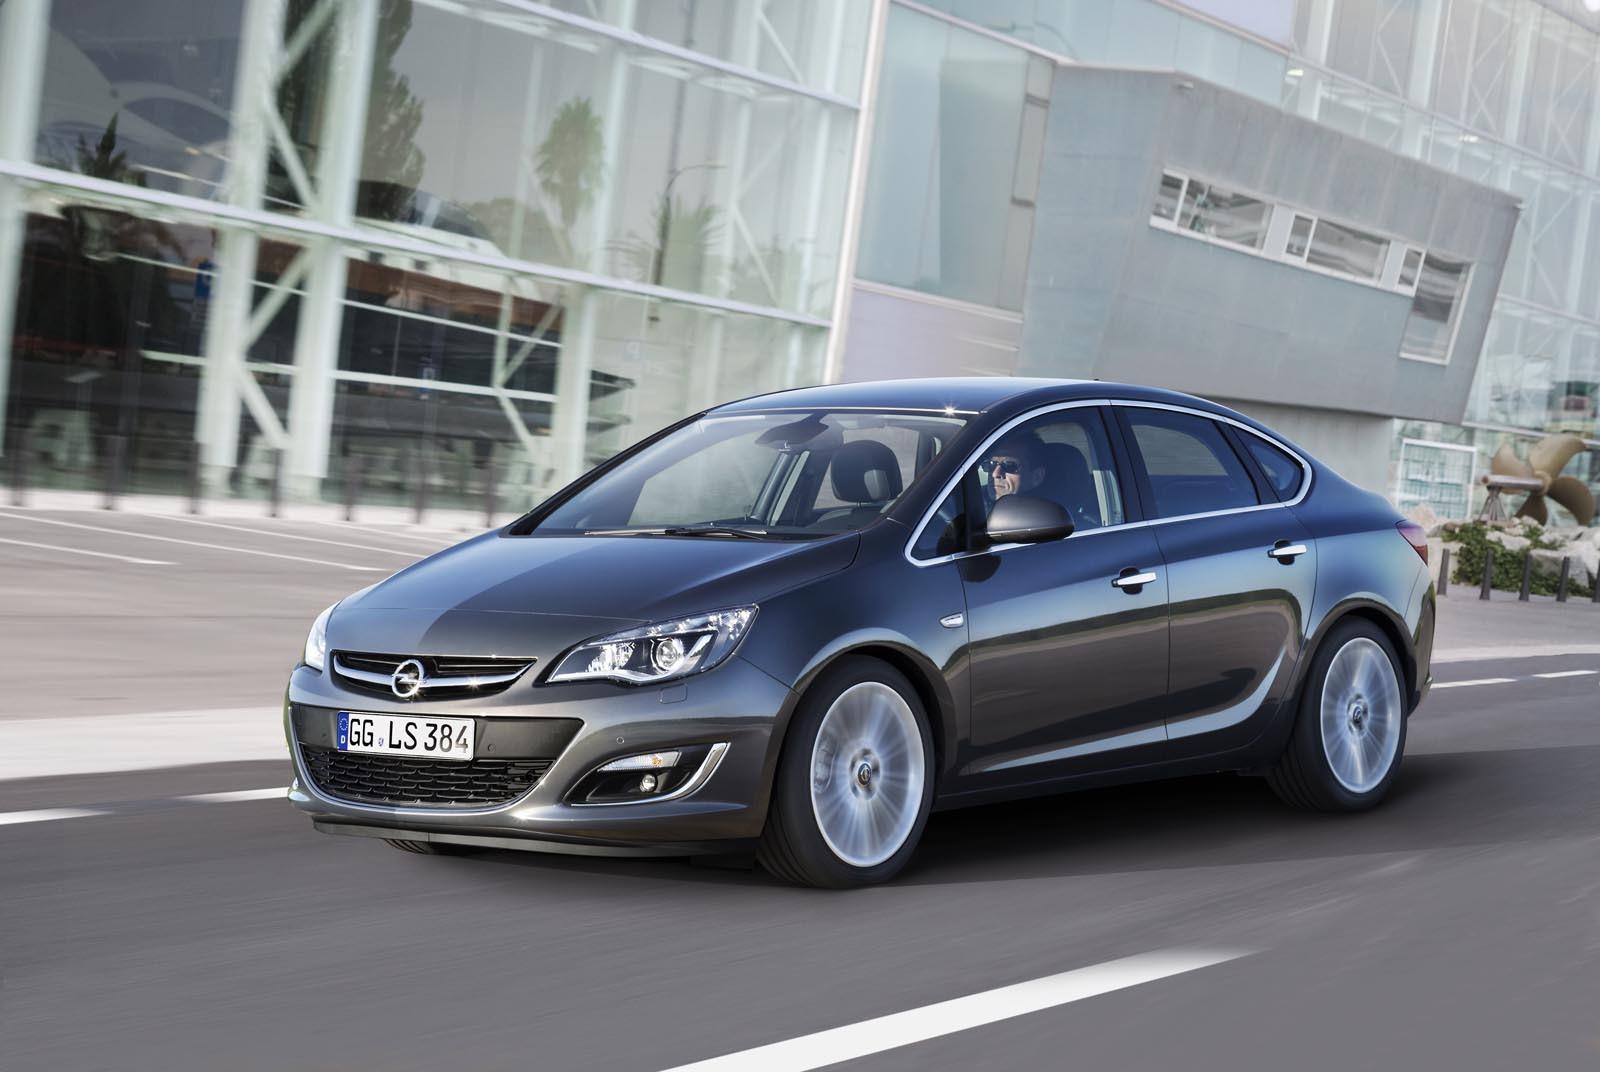 Opel Astra 2012 are dreptul la un usor facelift exterior, care ii subliniaza eleganta